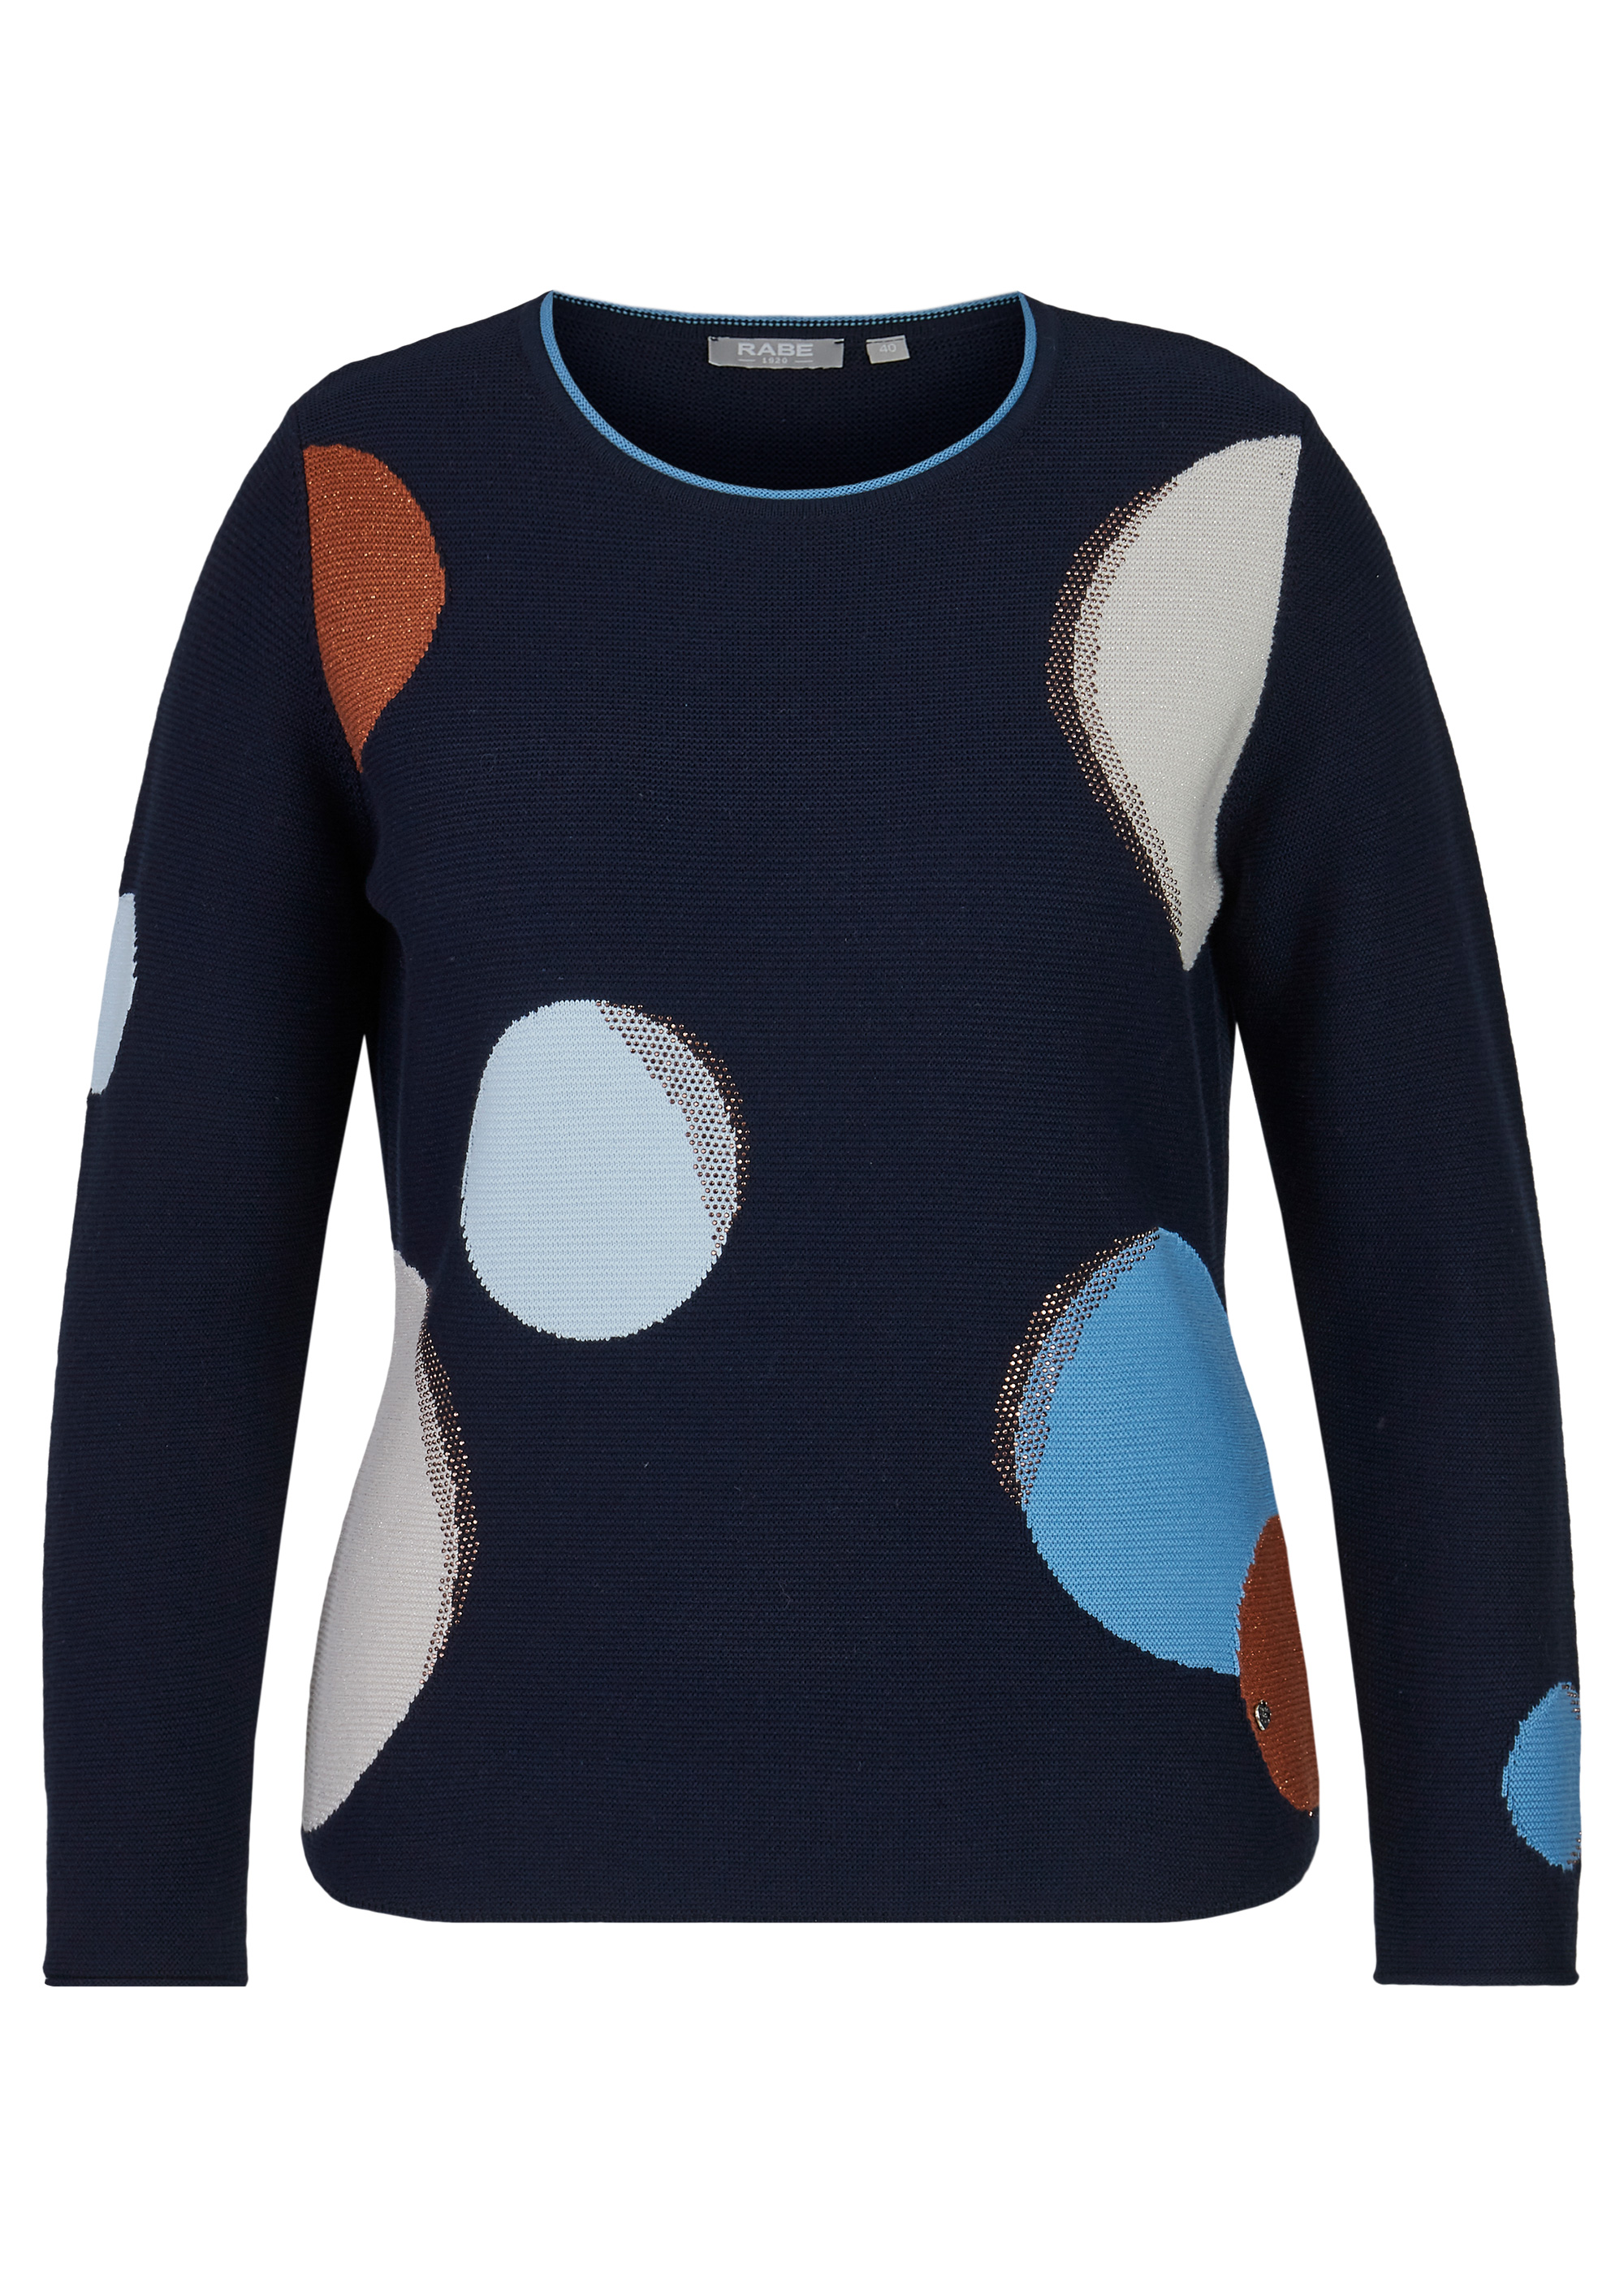 Rabe Pullover blau